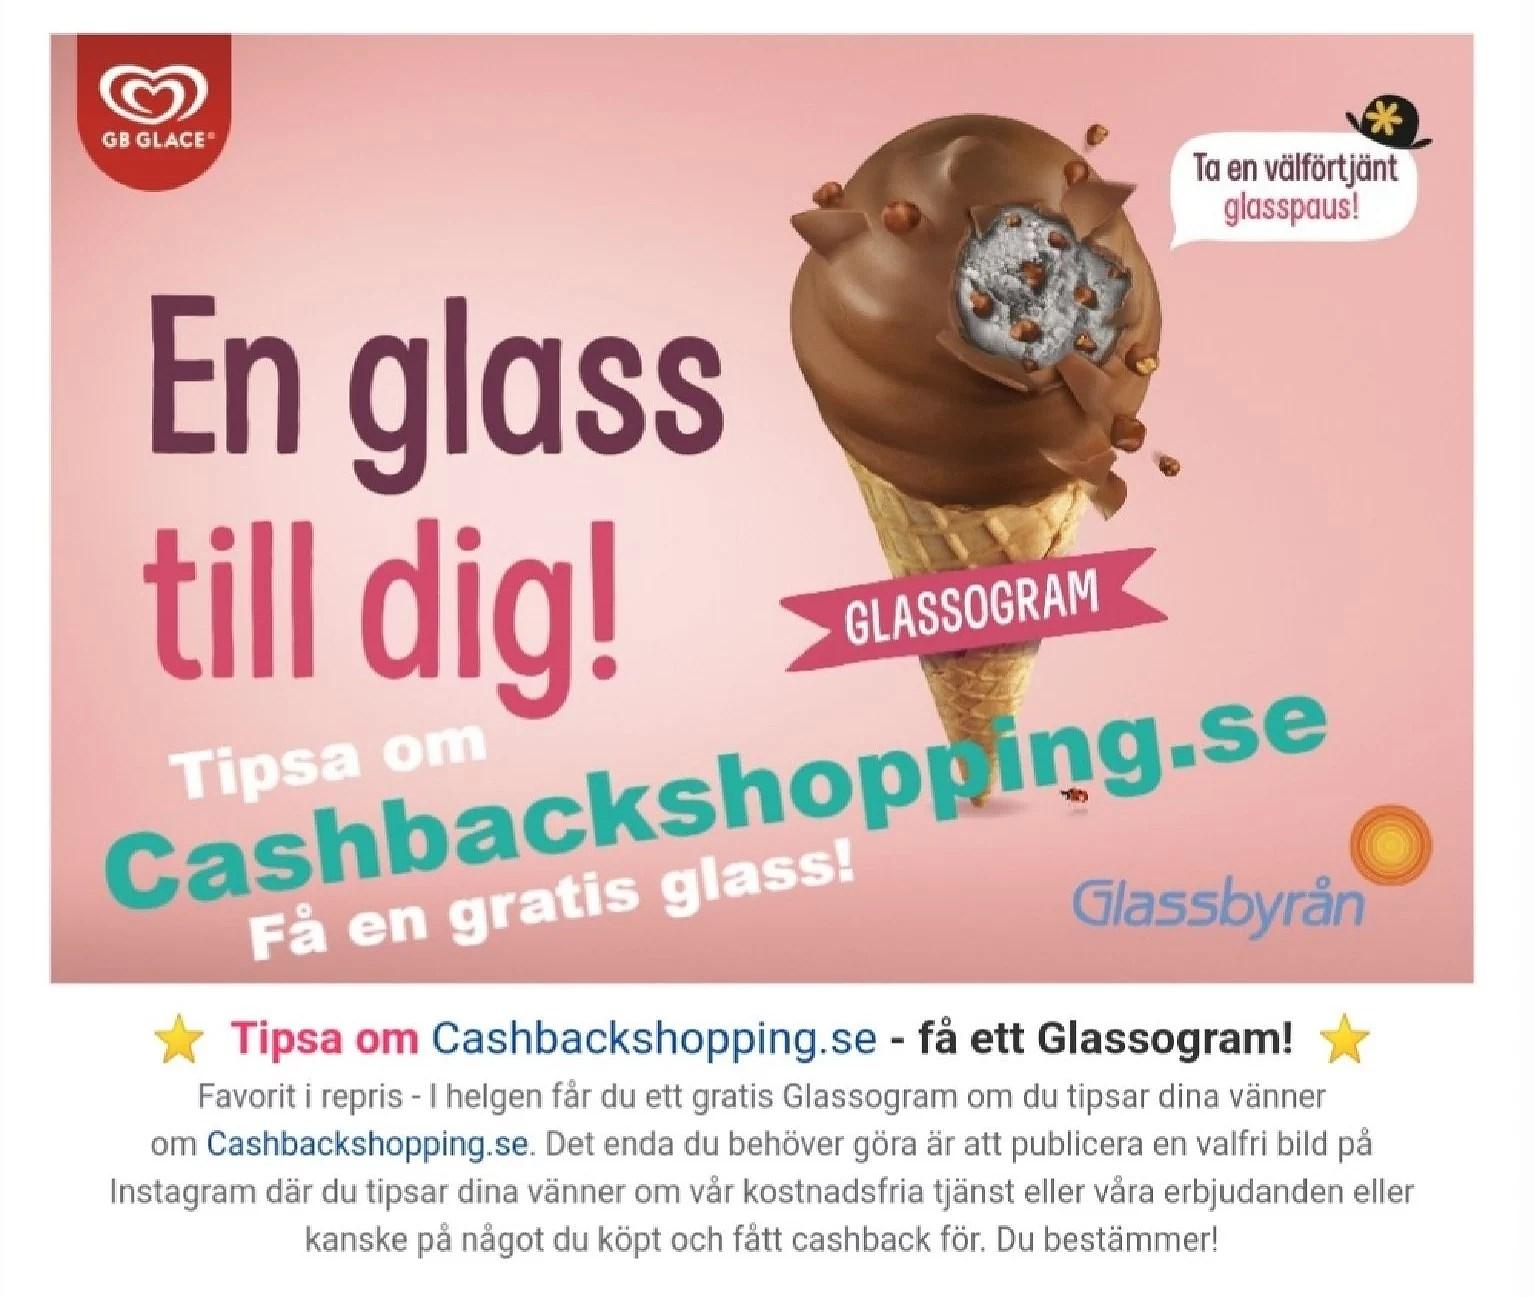 Tipsa om Cashbackshopping och få ett Glassogram :)